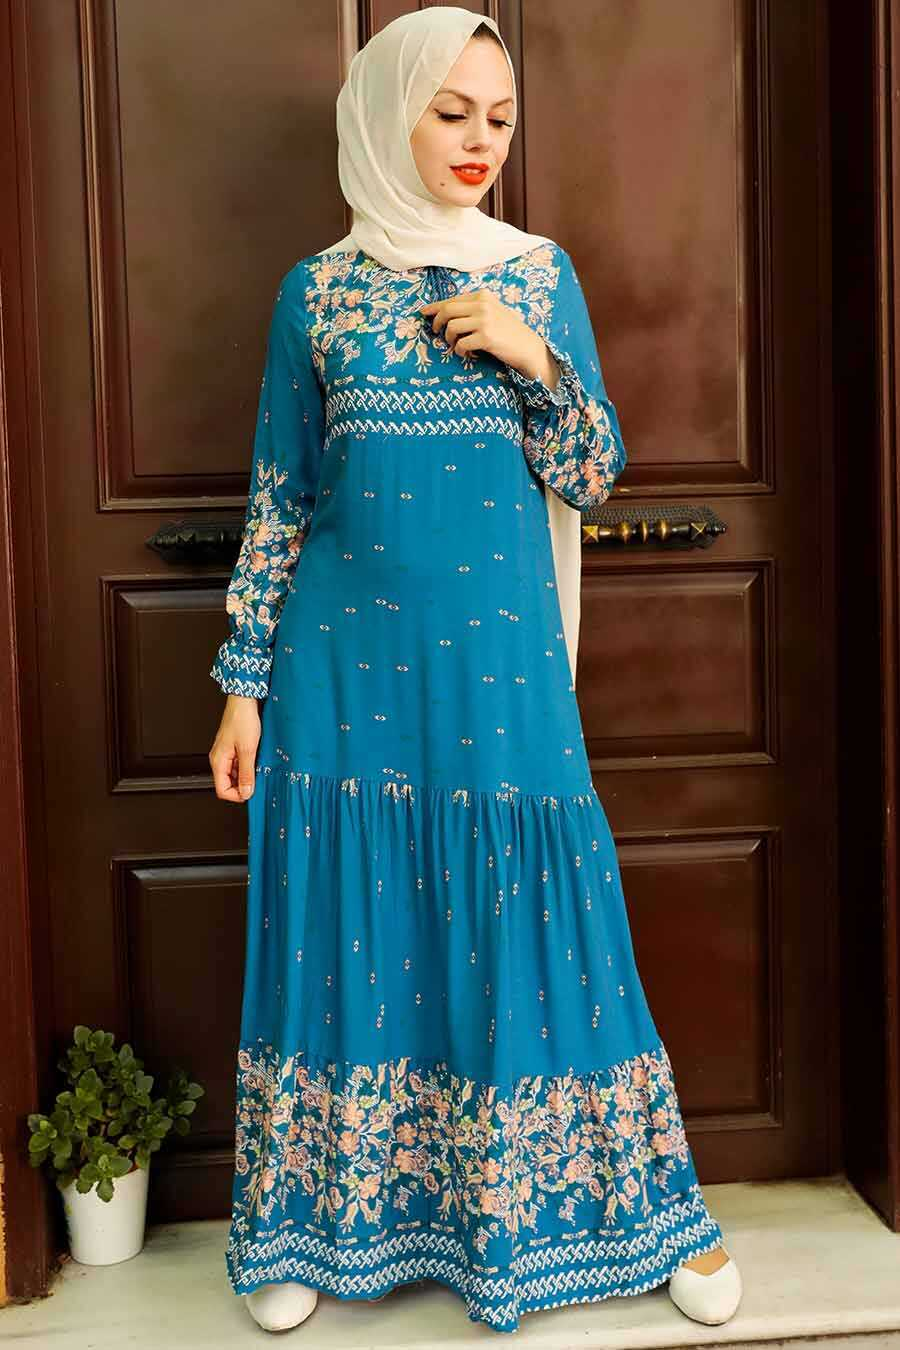 İndigo Blue Hijab Dress 5191IM